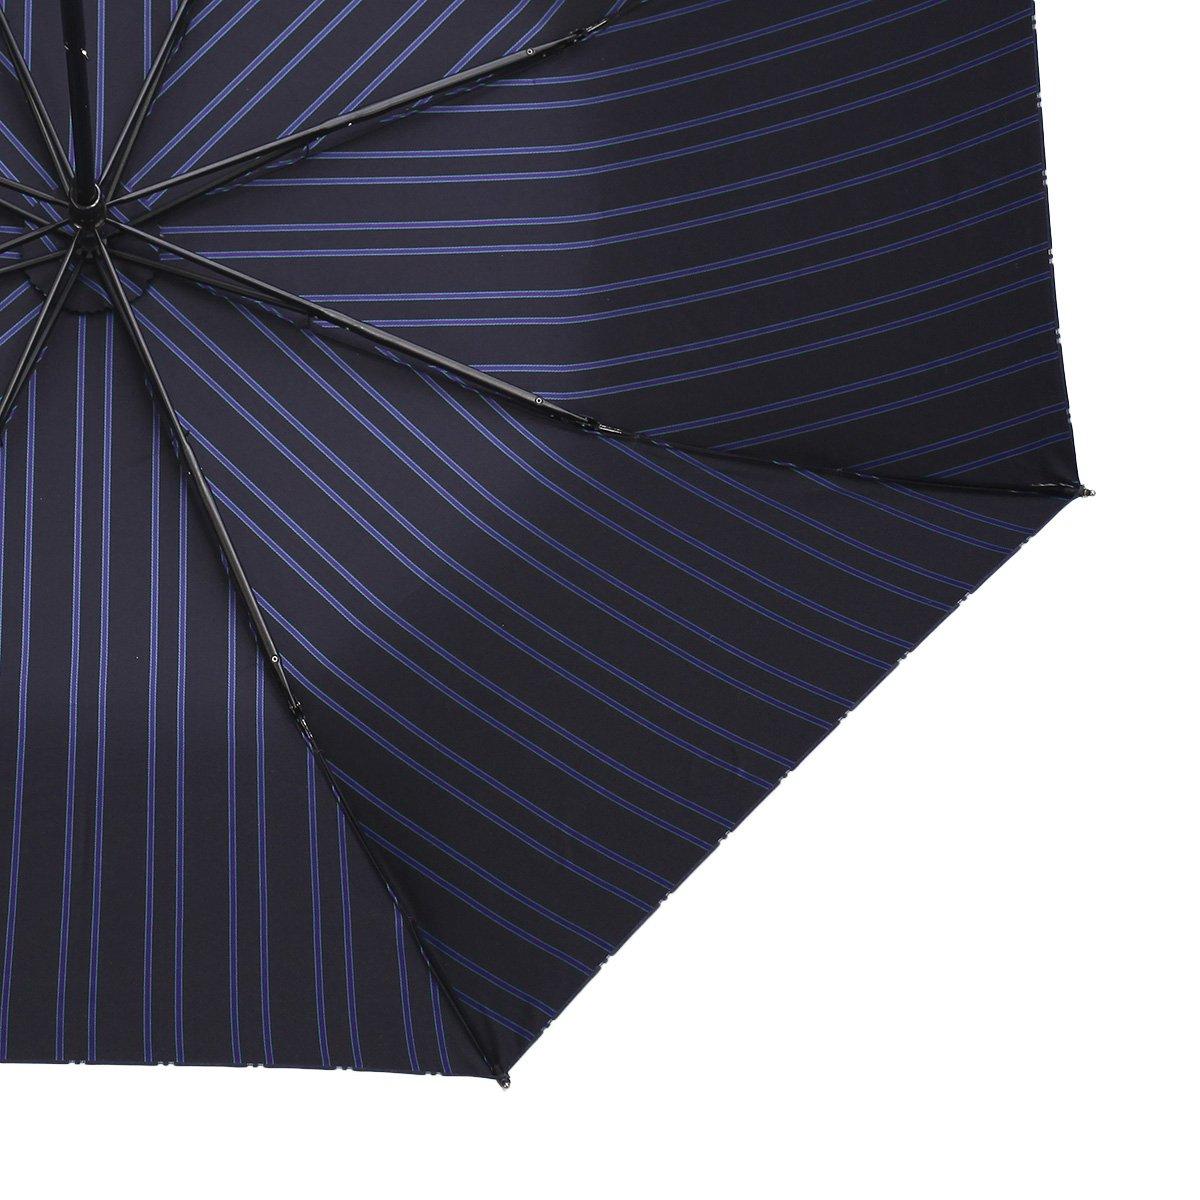 Wフェイス ストライプ 折りたたみ傘 詳細画像13